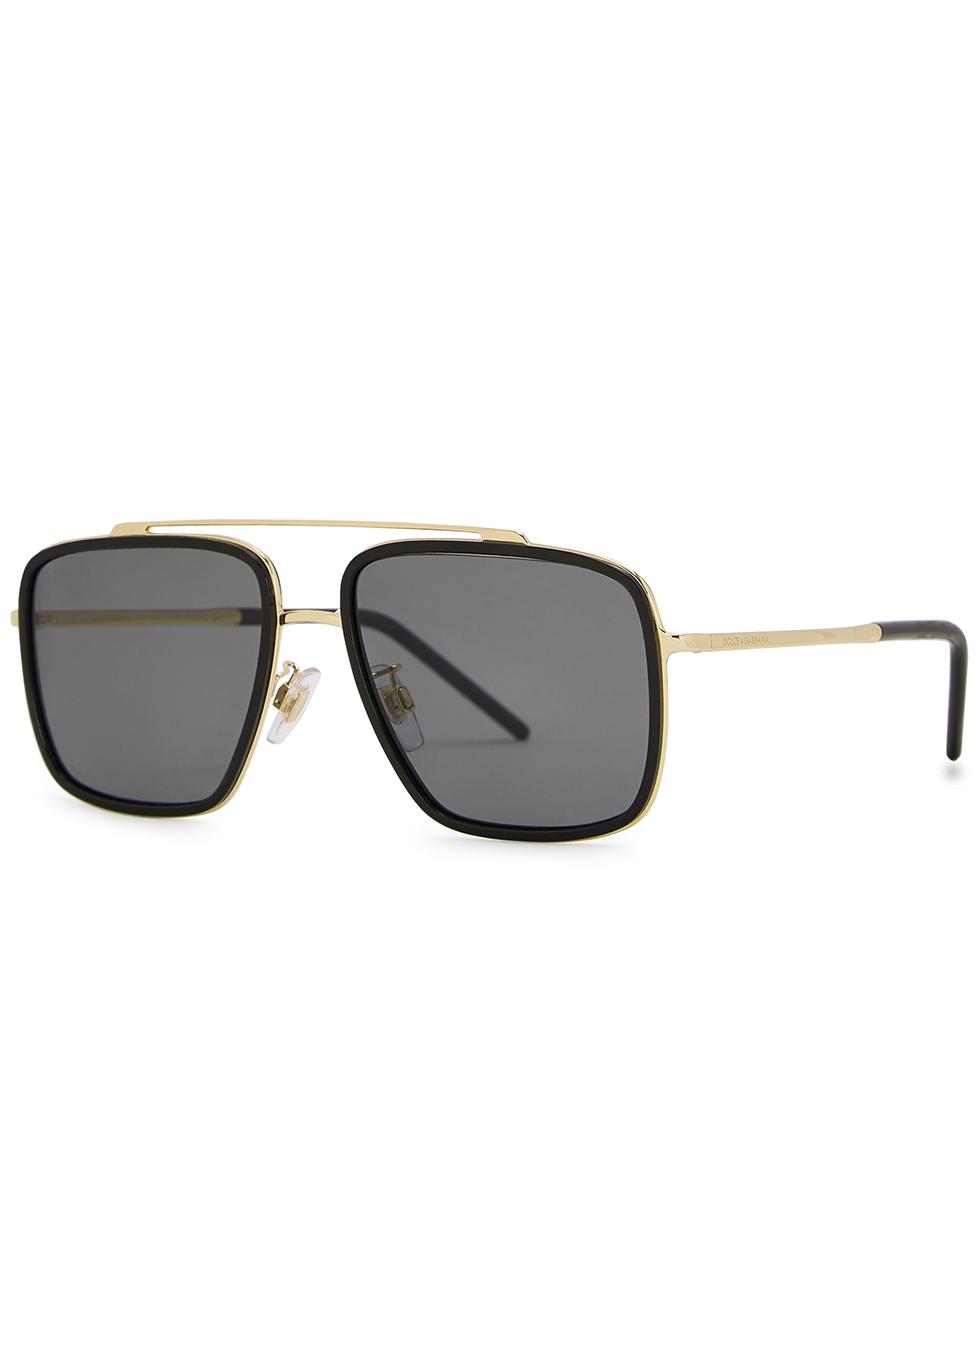 5e65562934783 Men s Designer Sunglasses   Eyewear - Harvey Nichols